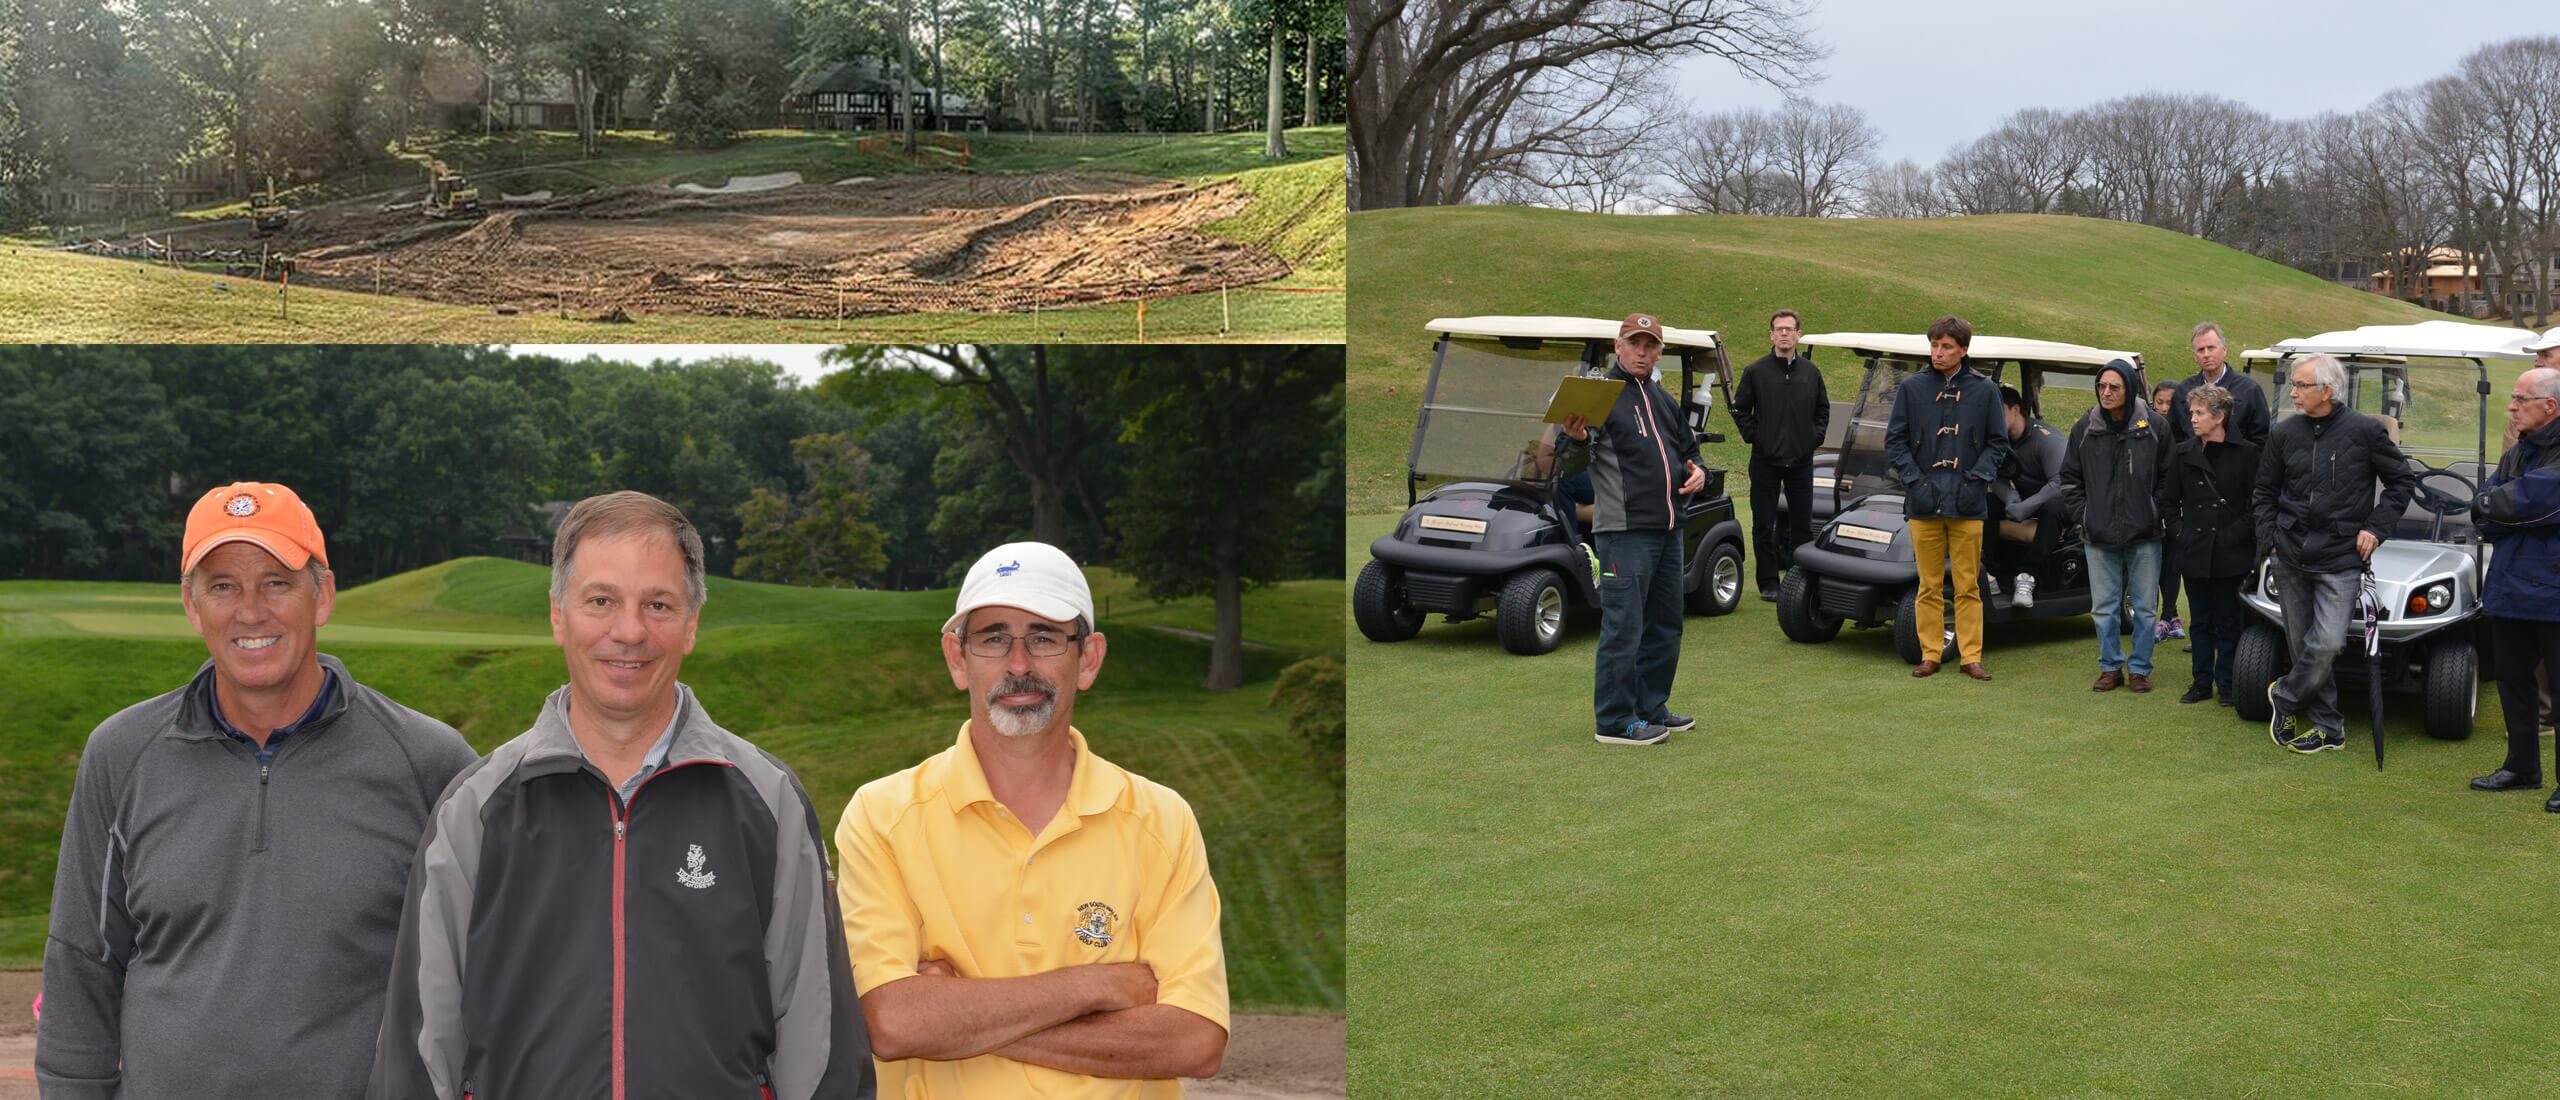 2014-2015 – The Greens Restoration Ushers in a New Era of Golf